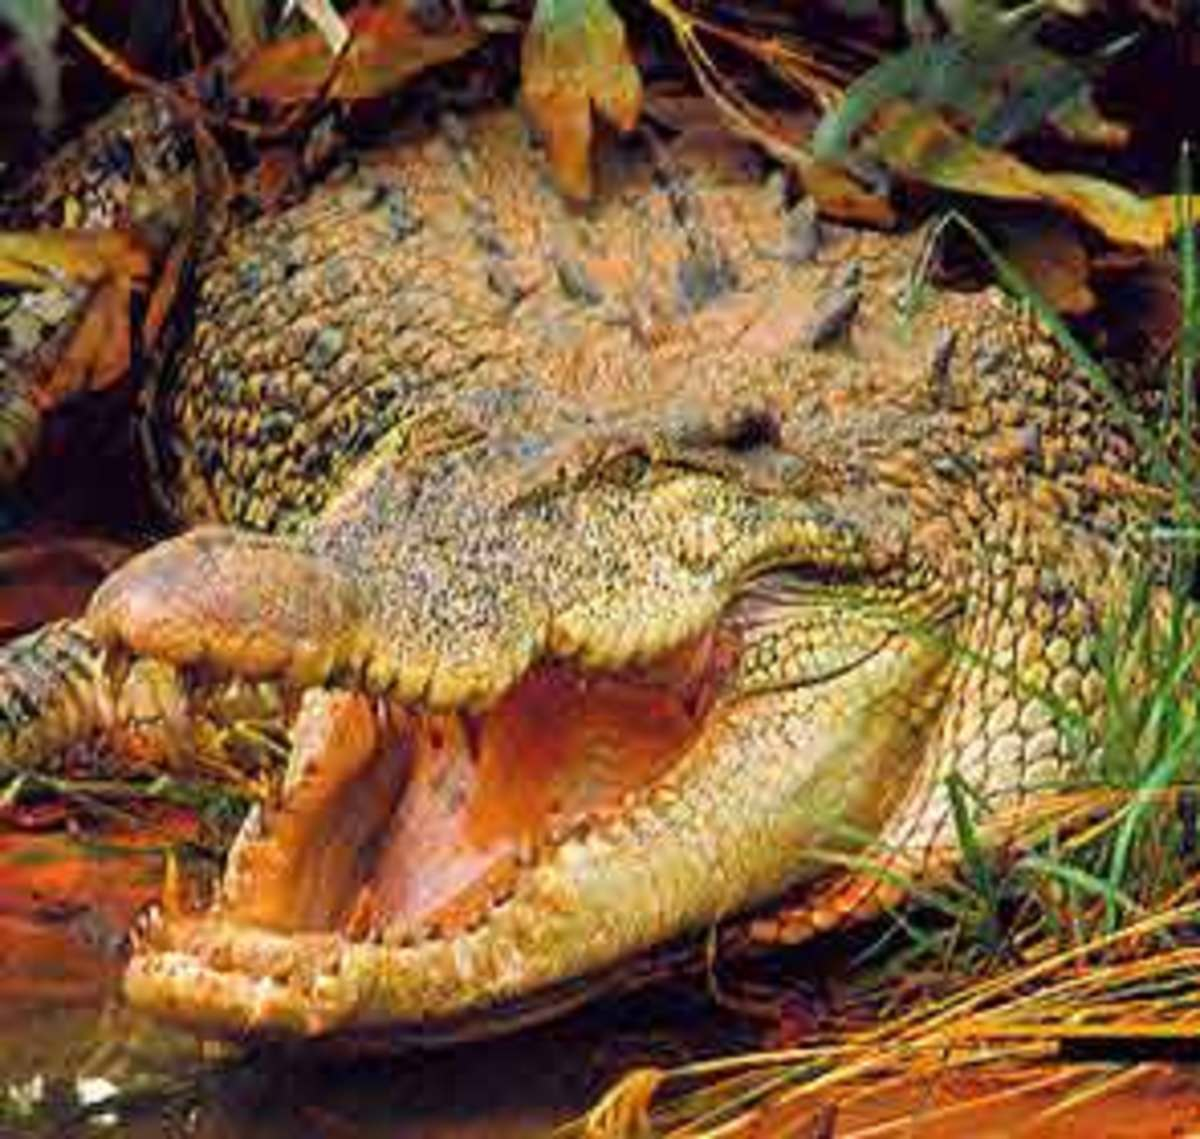 Crocodiles are Abundent in India